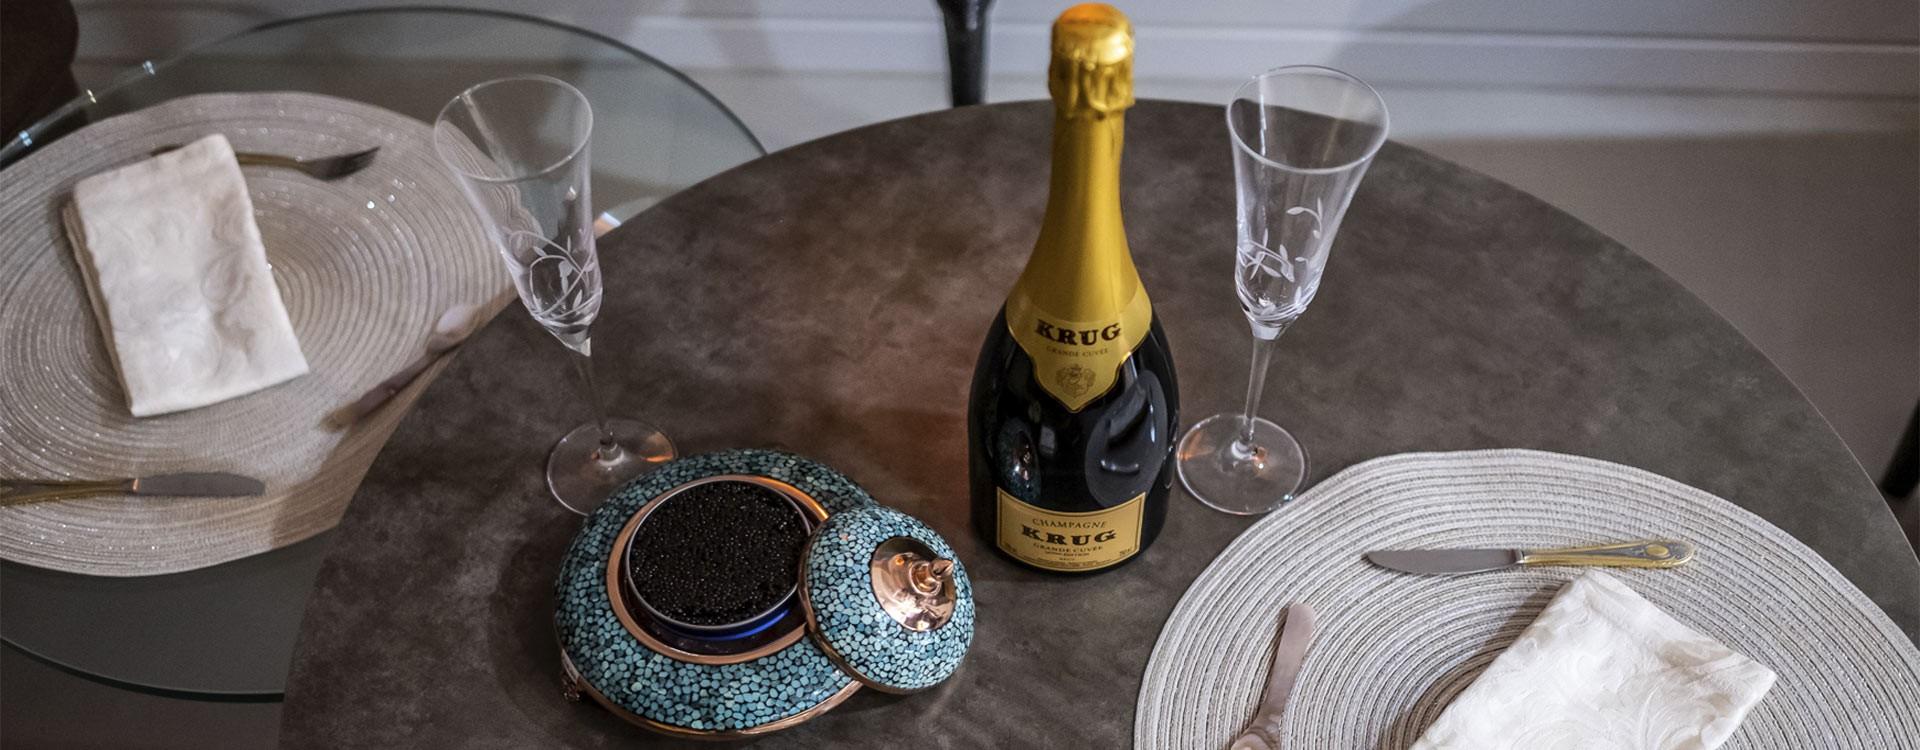 Caviar accessories in Switzerland